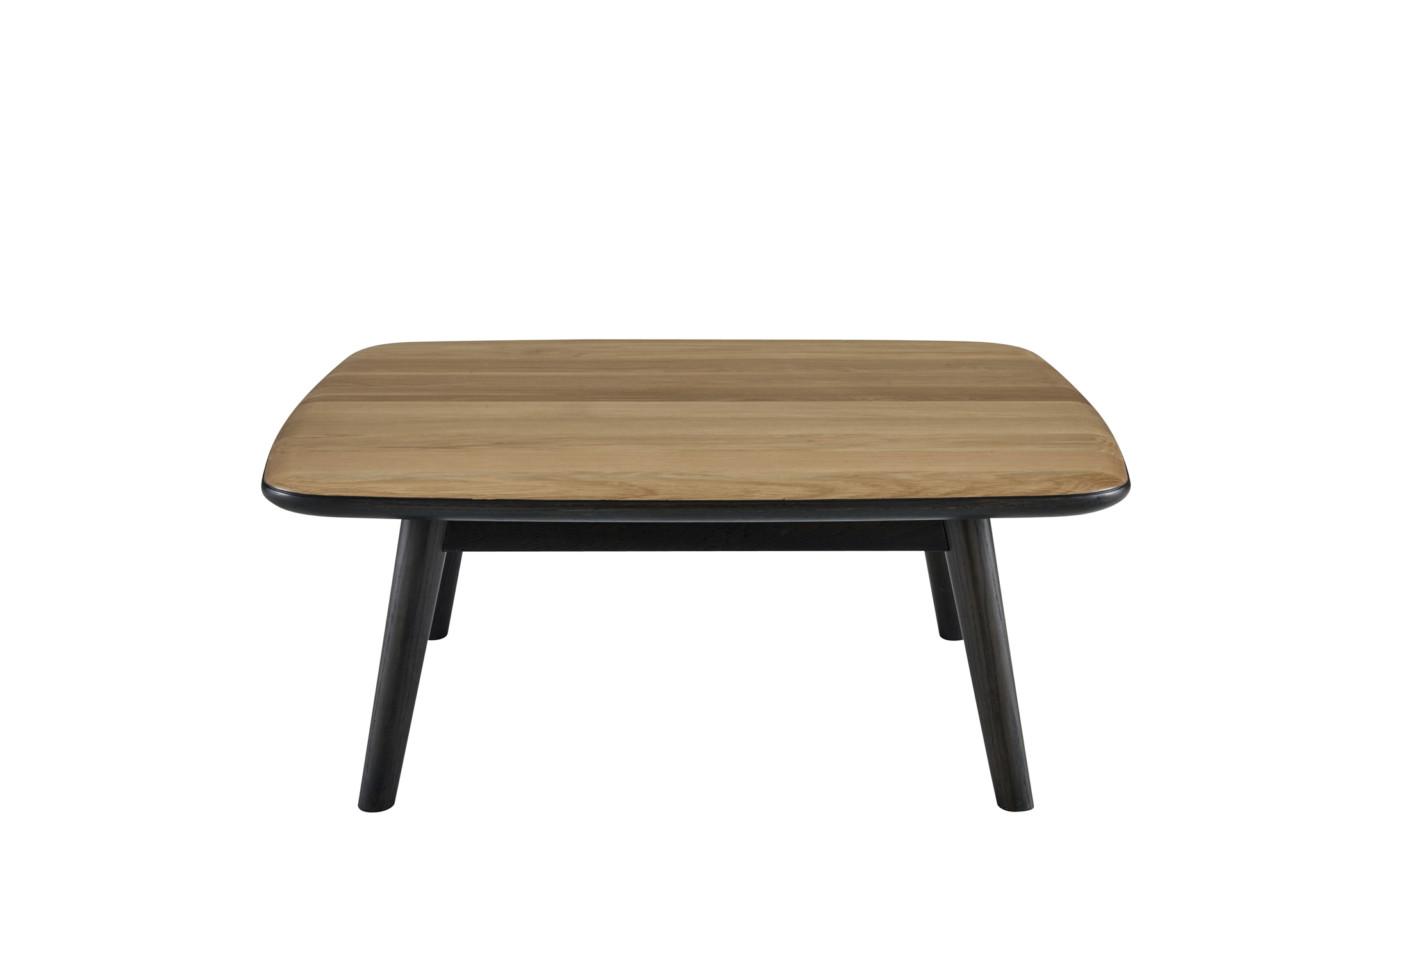 Lady carlotta coffee table by ligne roset stylepark - Table yoyo ligne roset ...